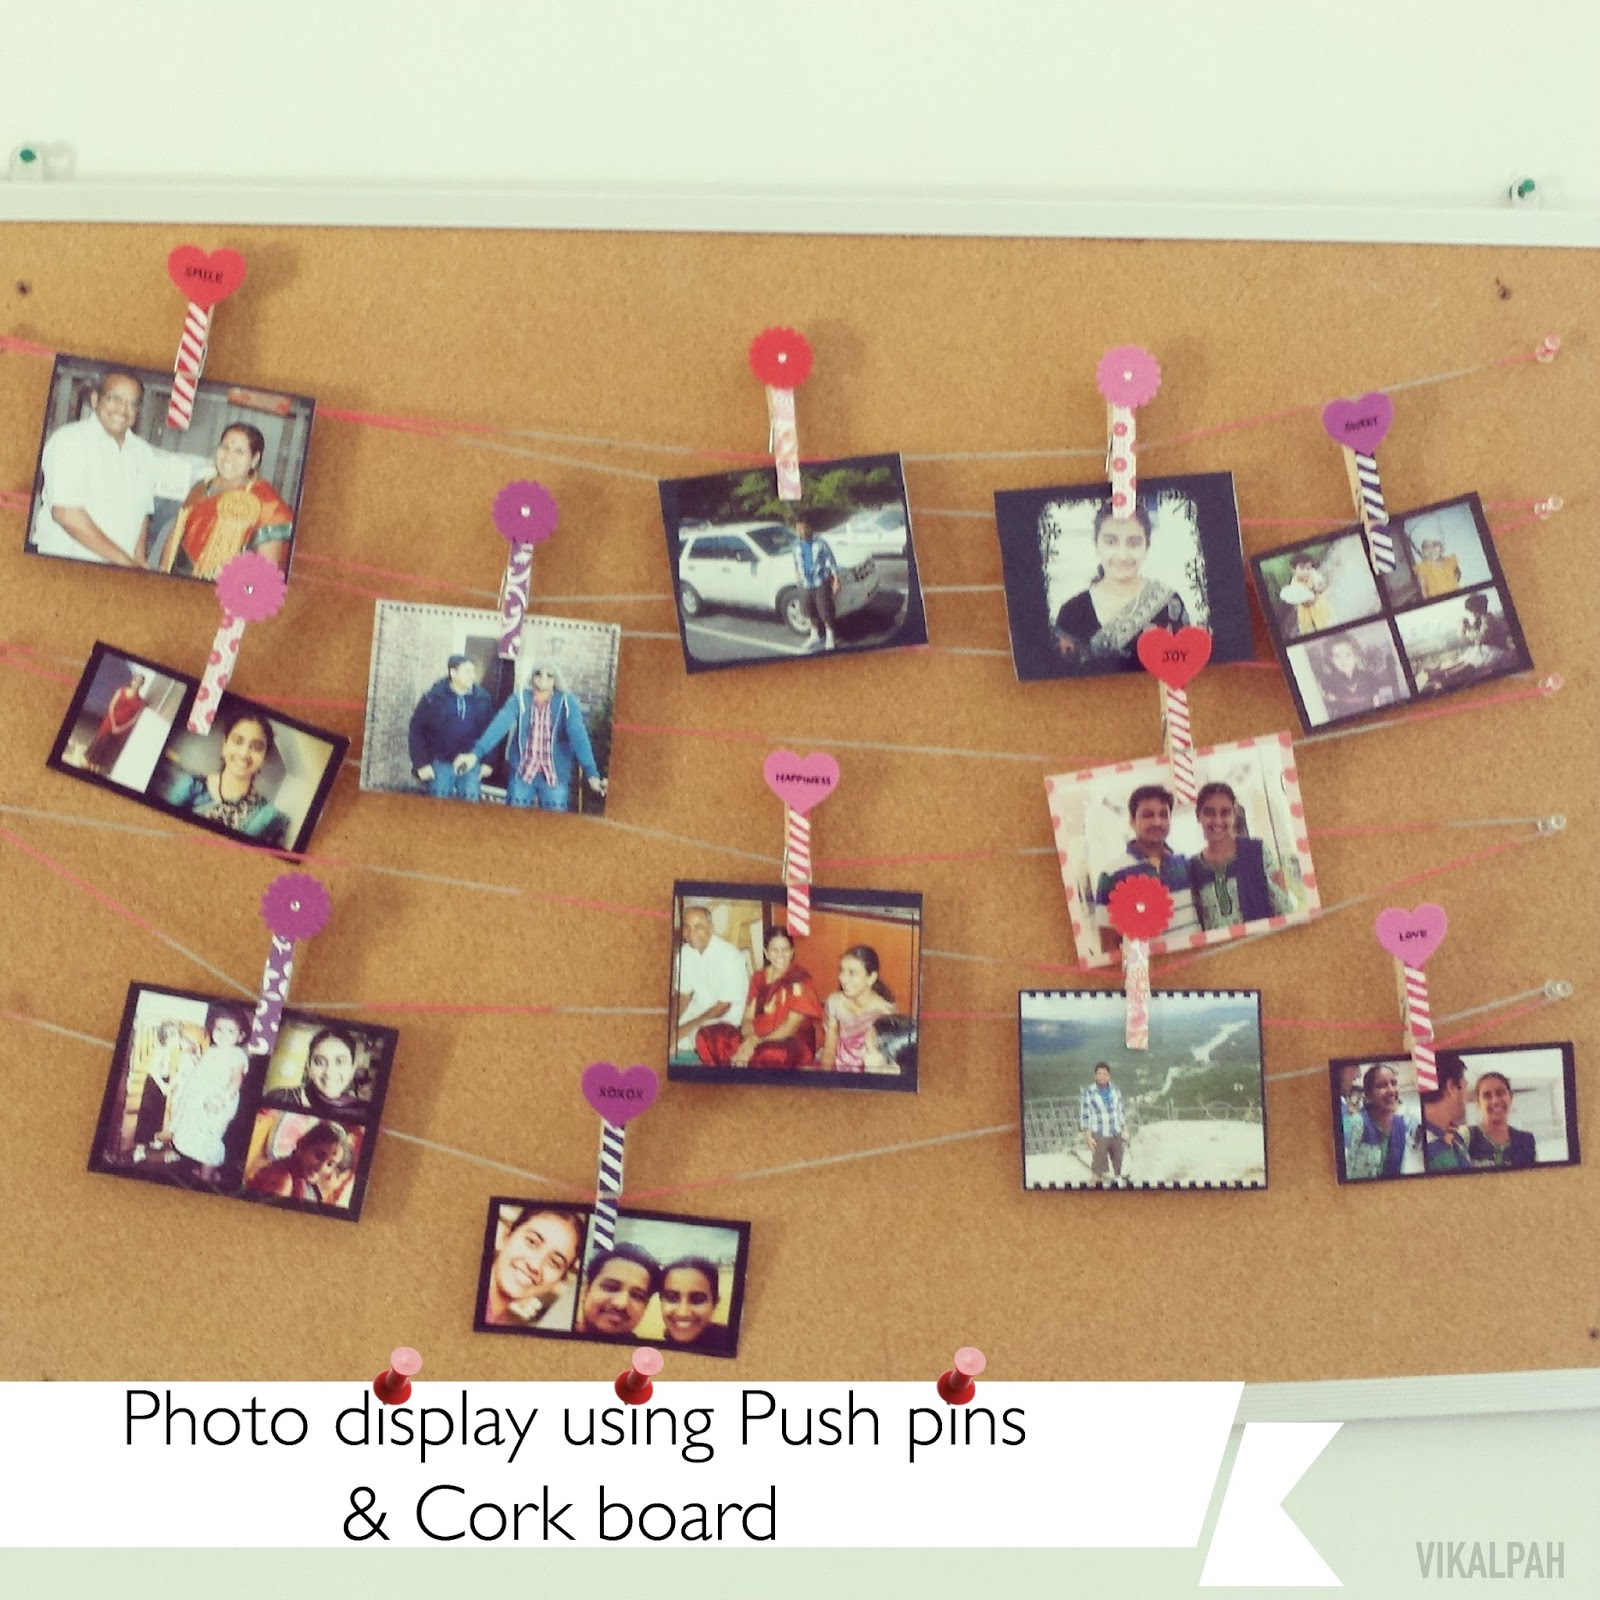 Vikalpah Photo Display using Push pins Corkboard